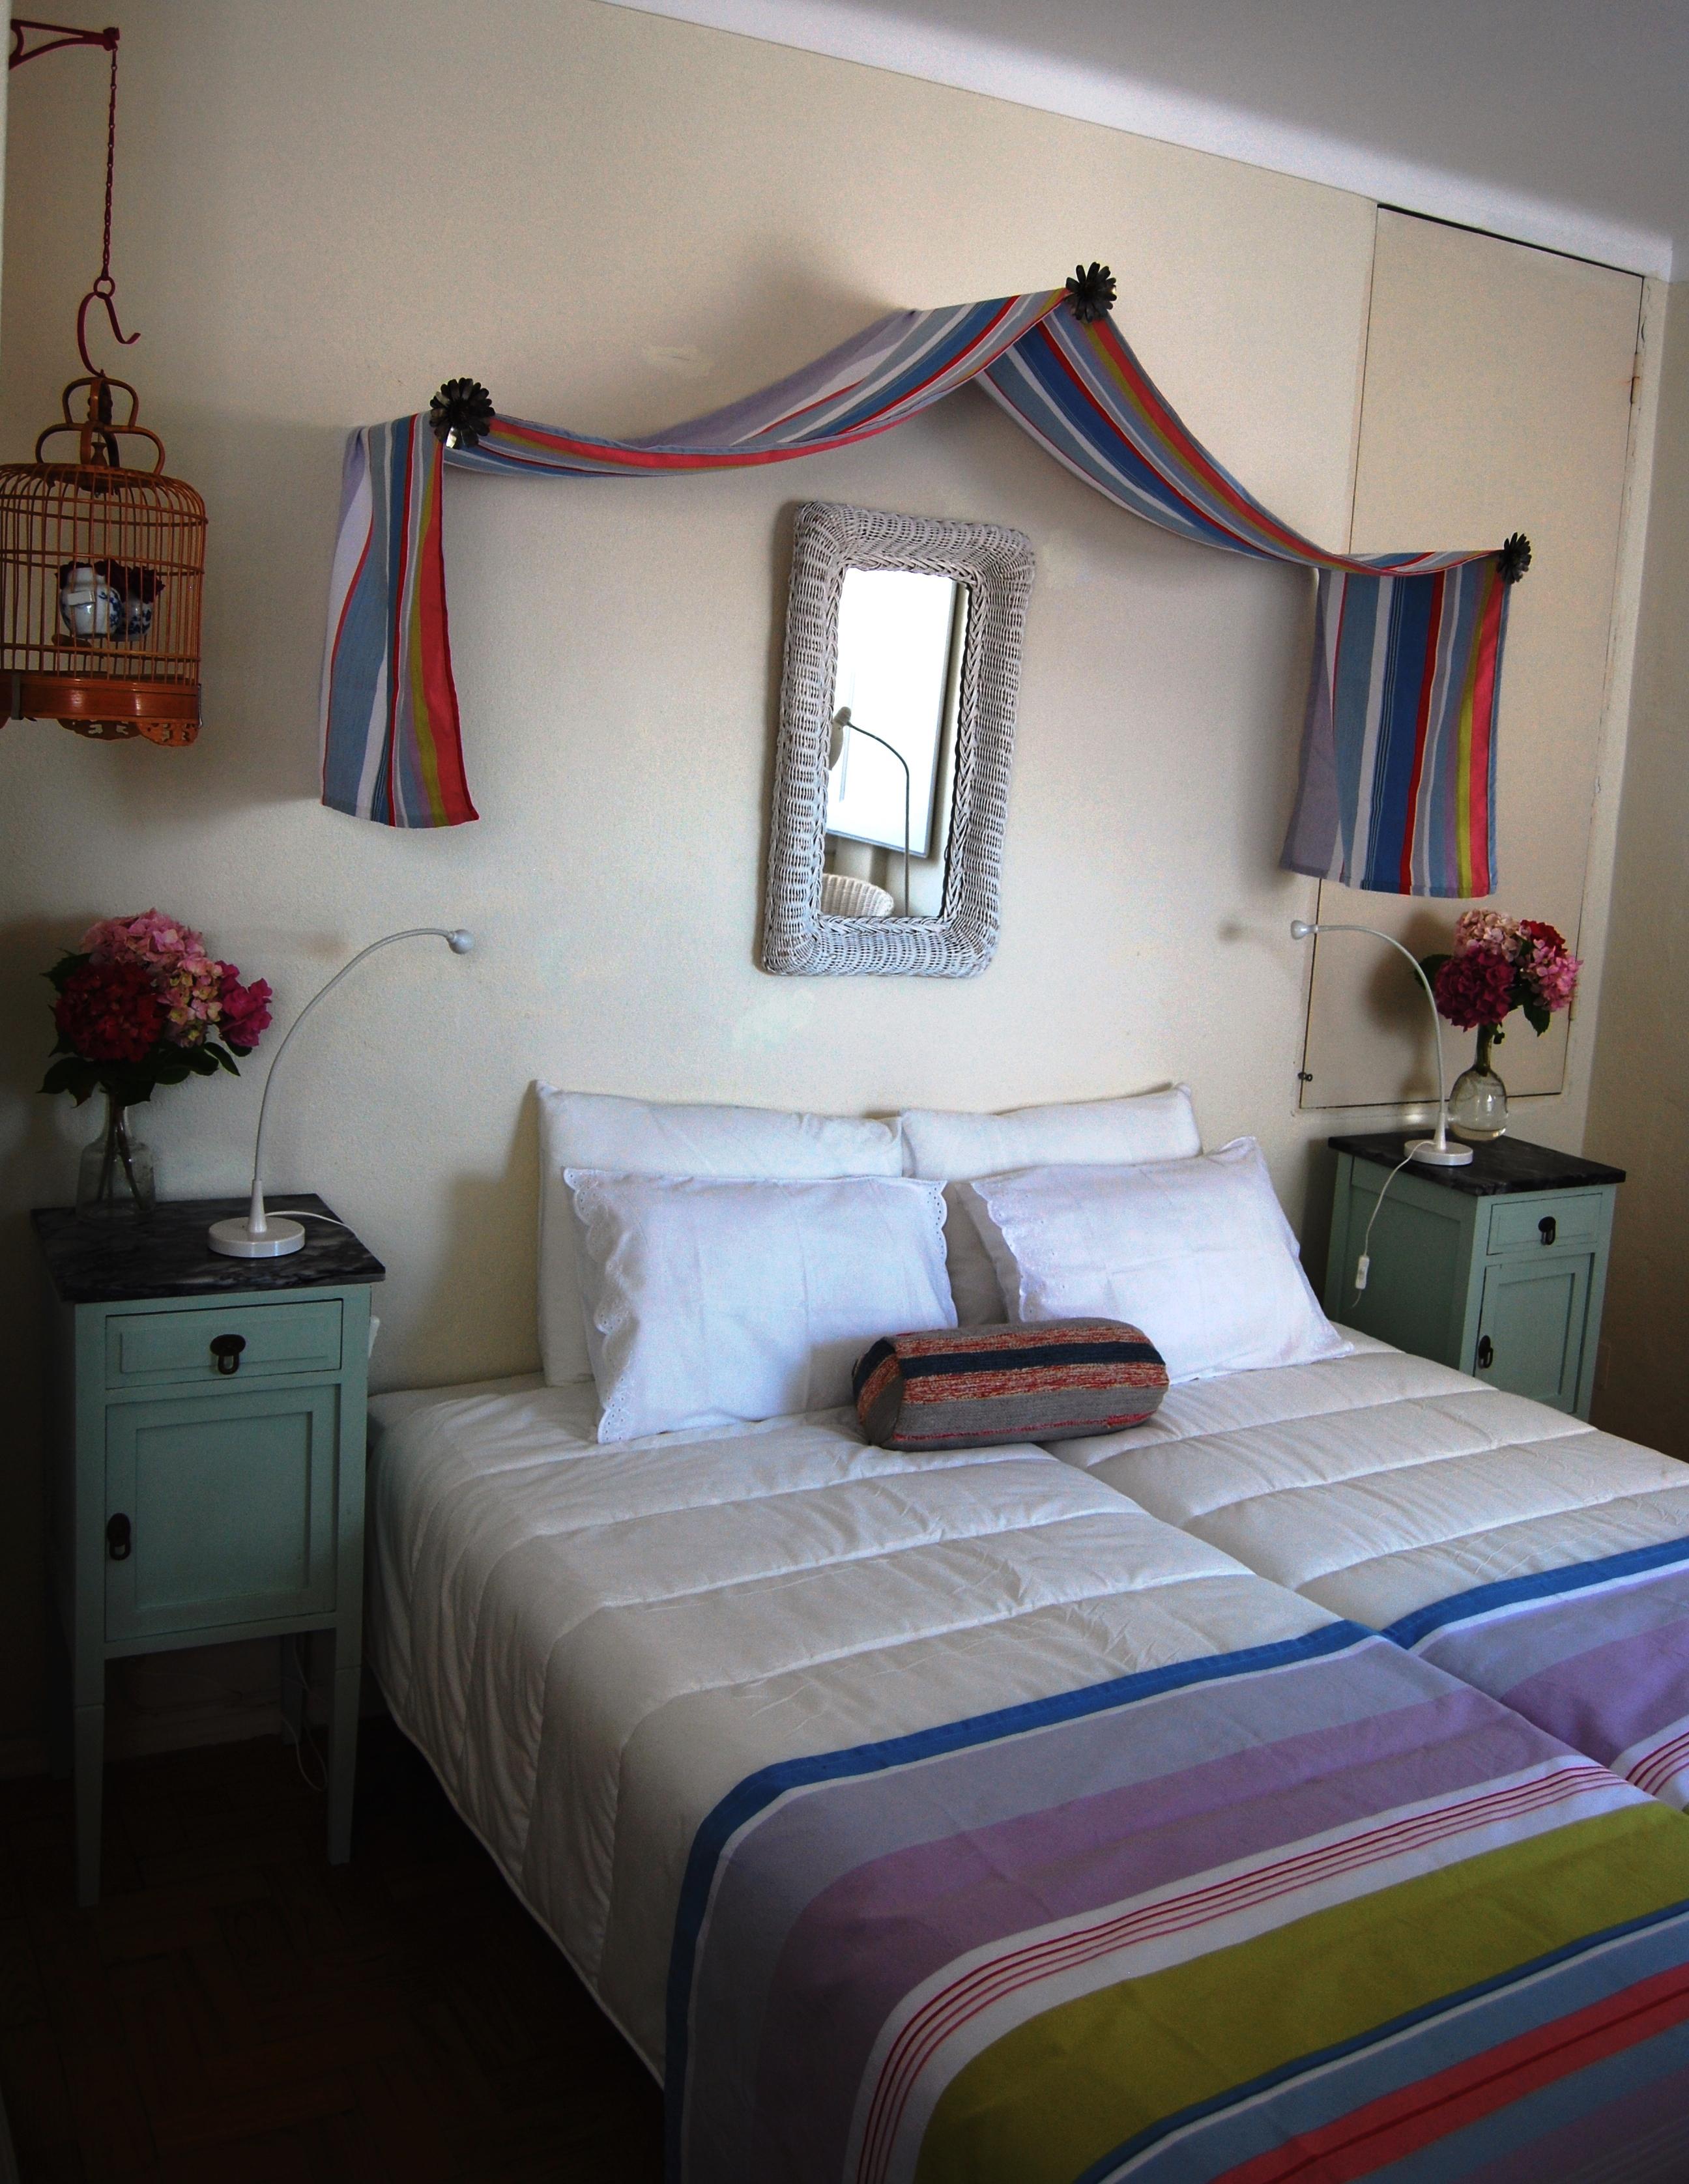 Holiday house Casa Maria d'Obidos - Ferienhaus - 3 Schlafzimmer, 2 Badezimmer, 6 (2599548), Óbidos, Costa de Prata, Central-Portugal, Portugal, picture 5